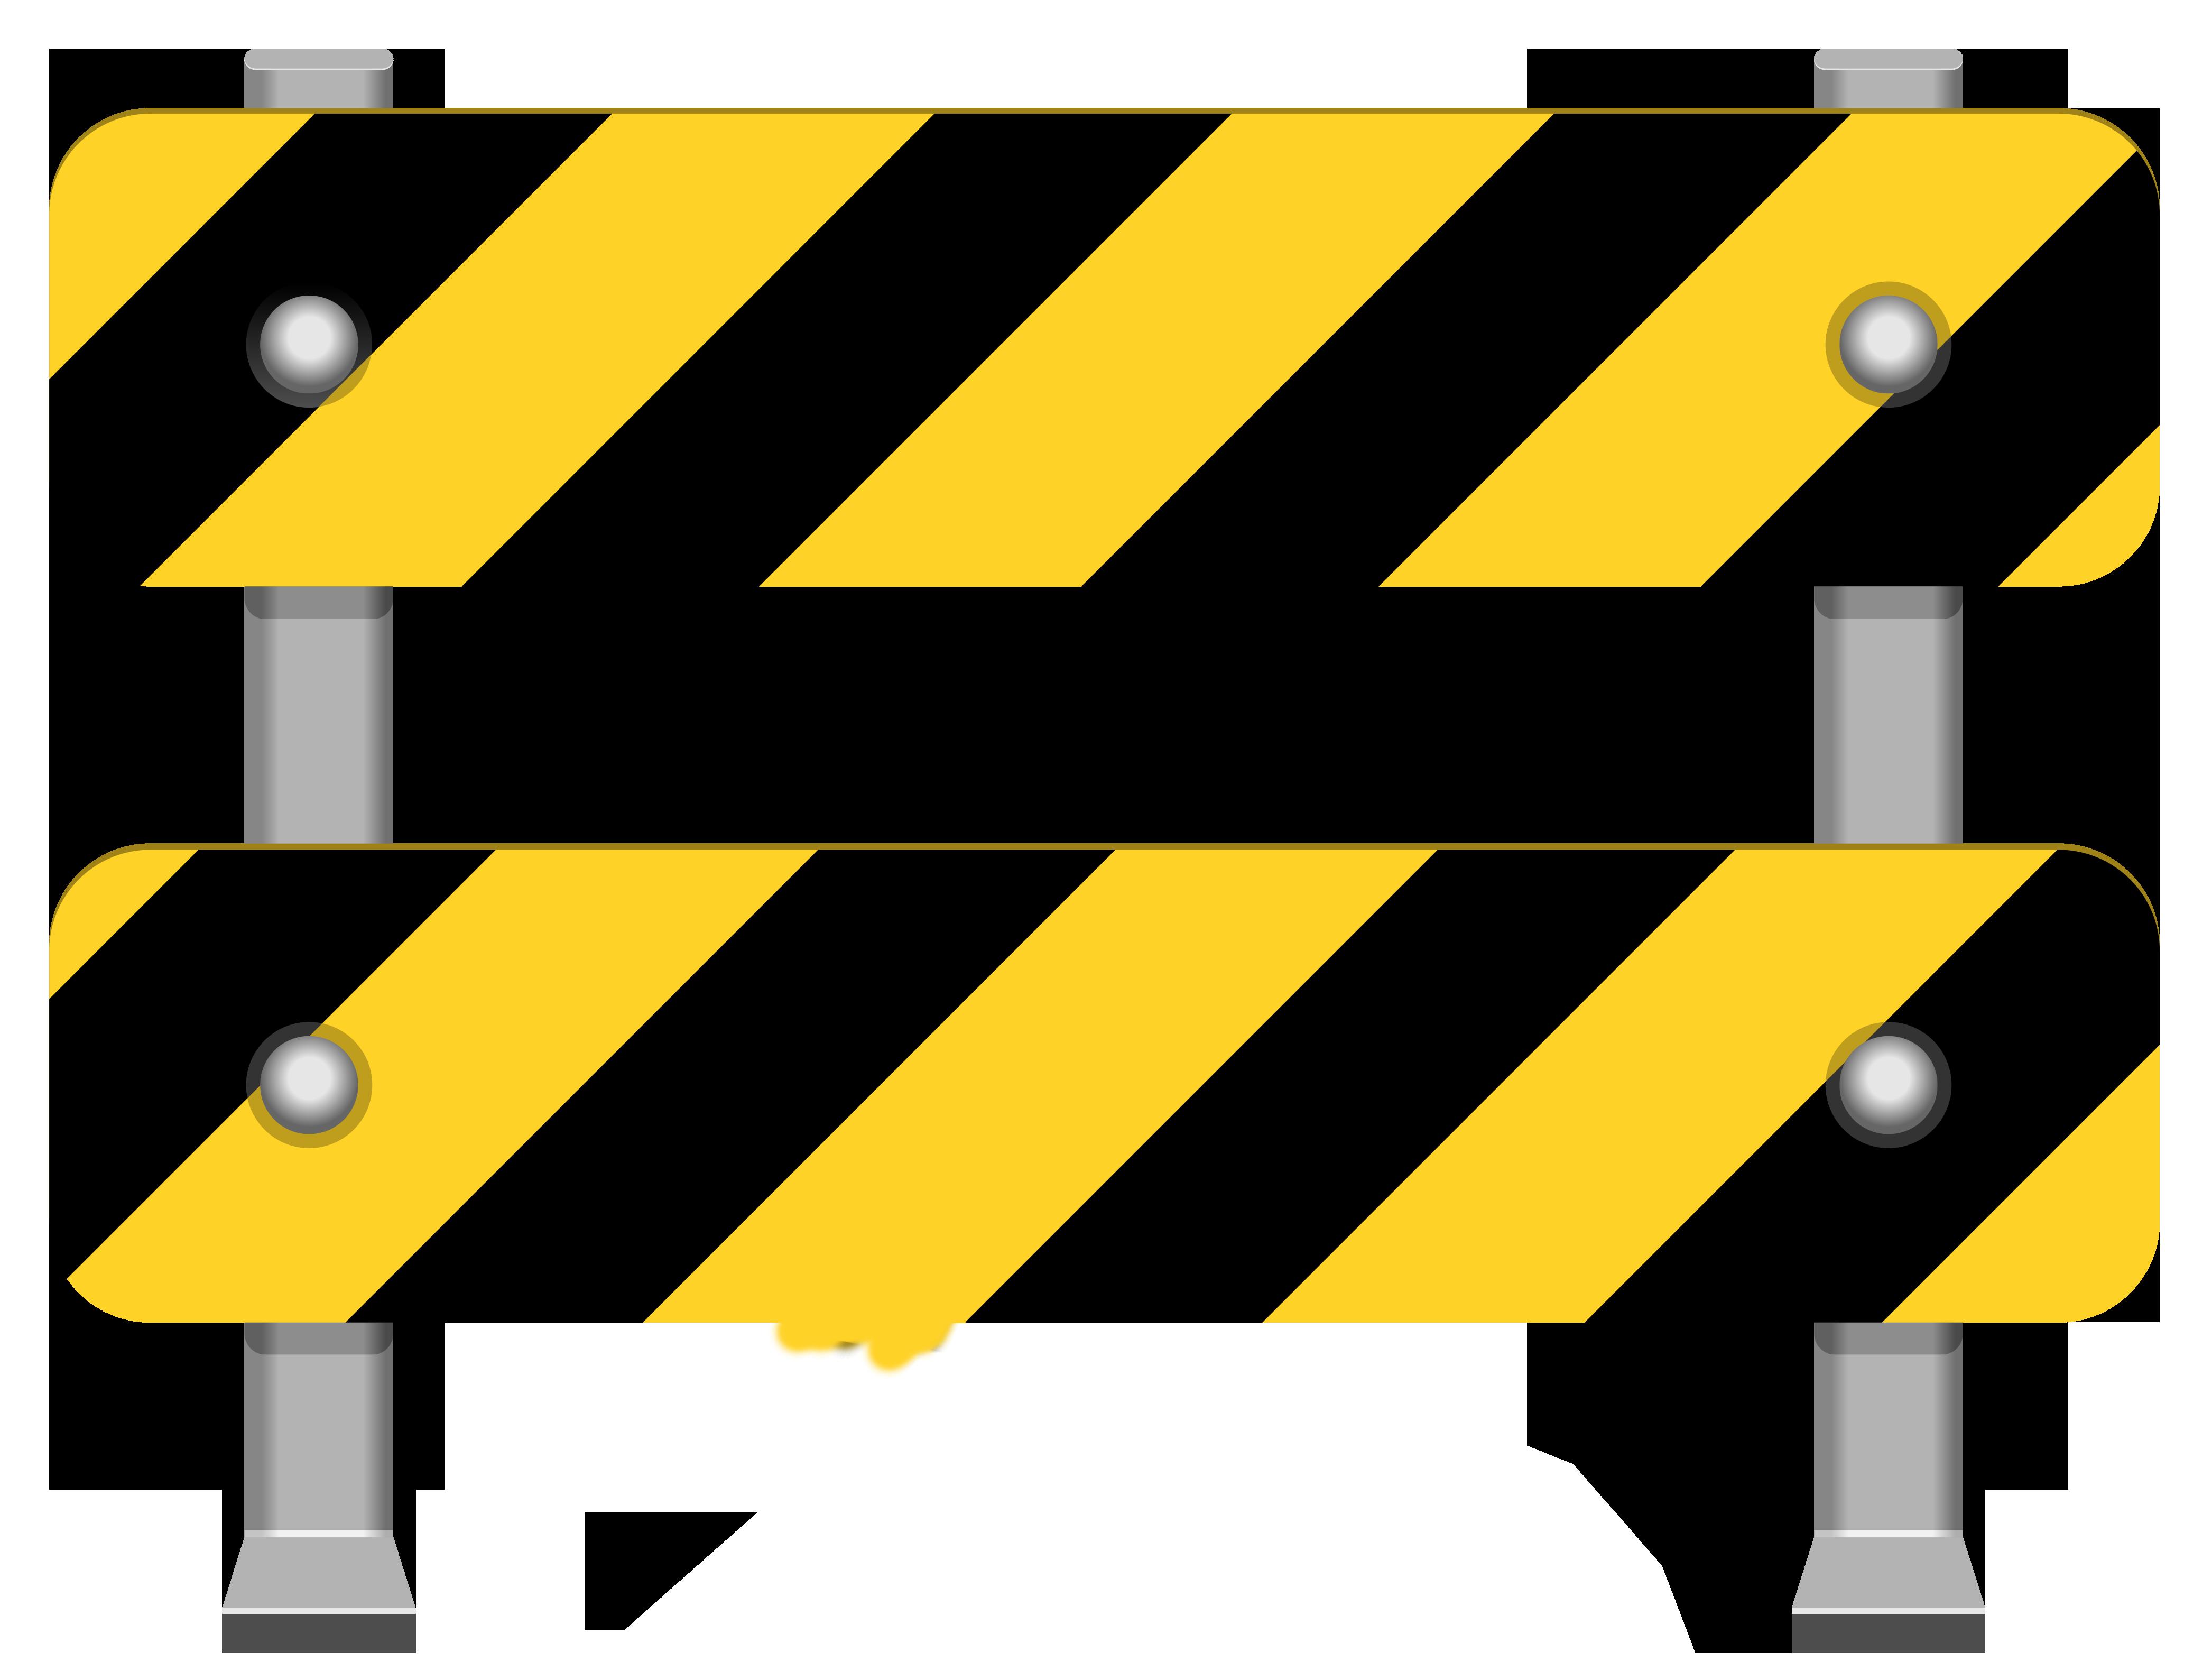 4185x3178 Yellow Road Barricade Png Clip Art